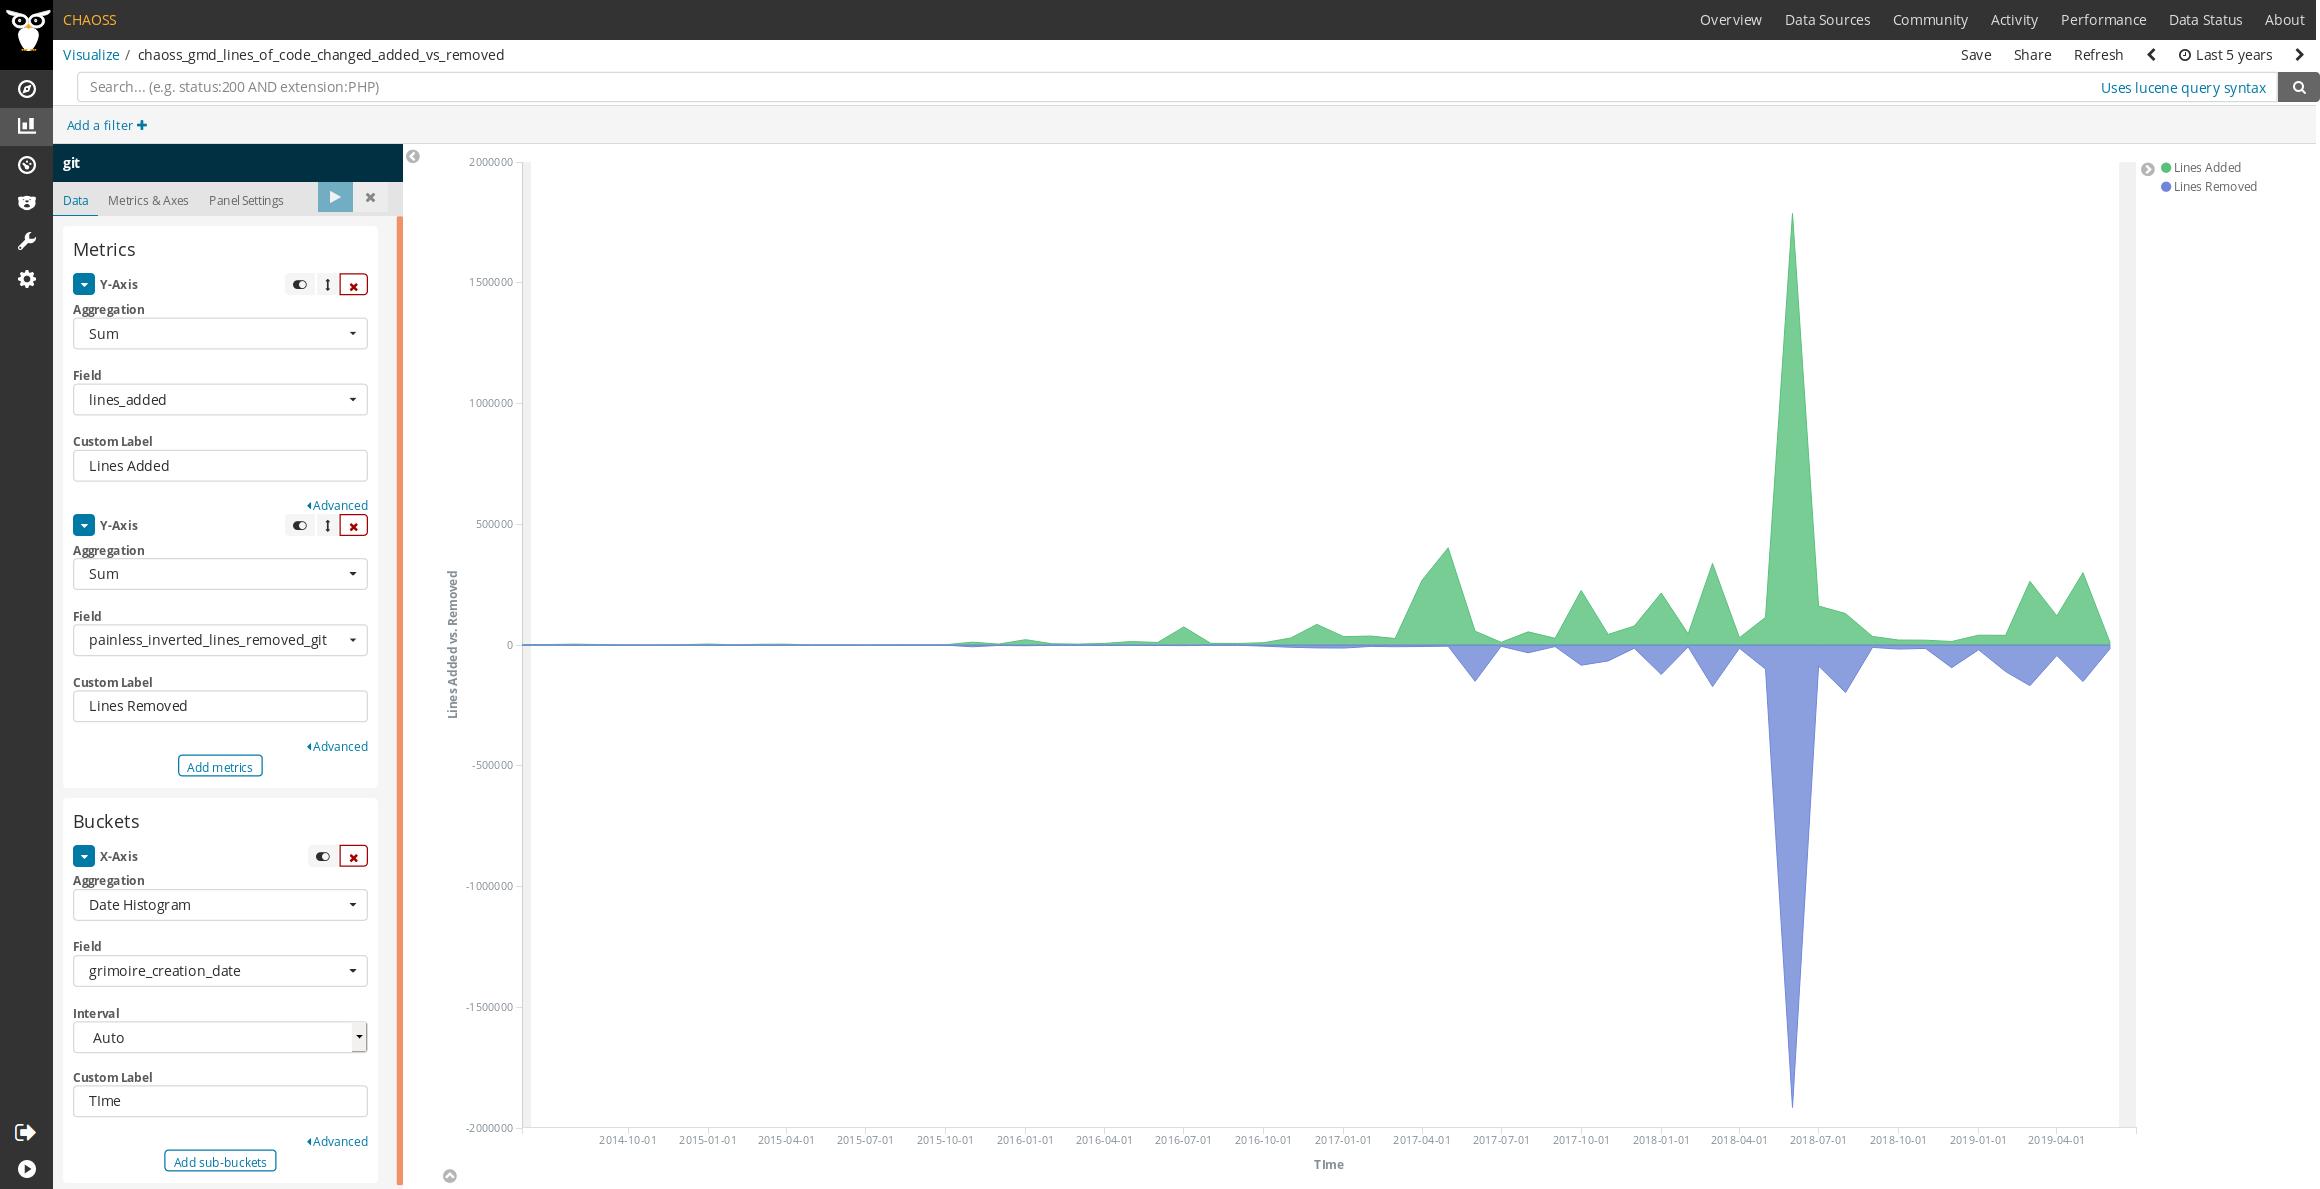 GrimoireLab screenshot of metric Code_Changes_Lines